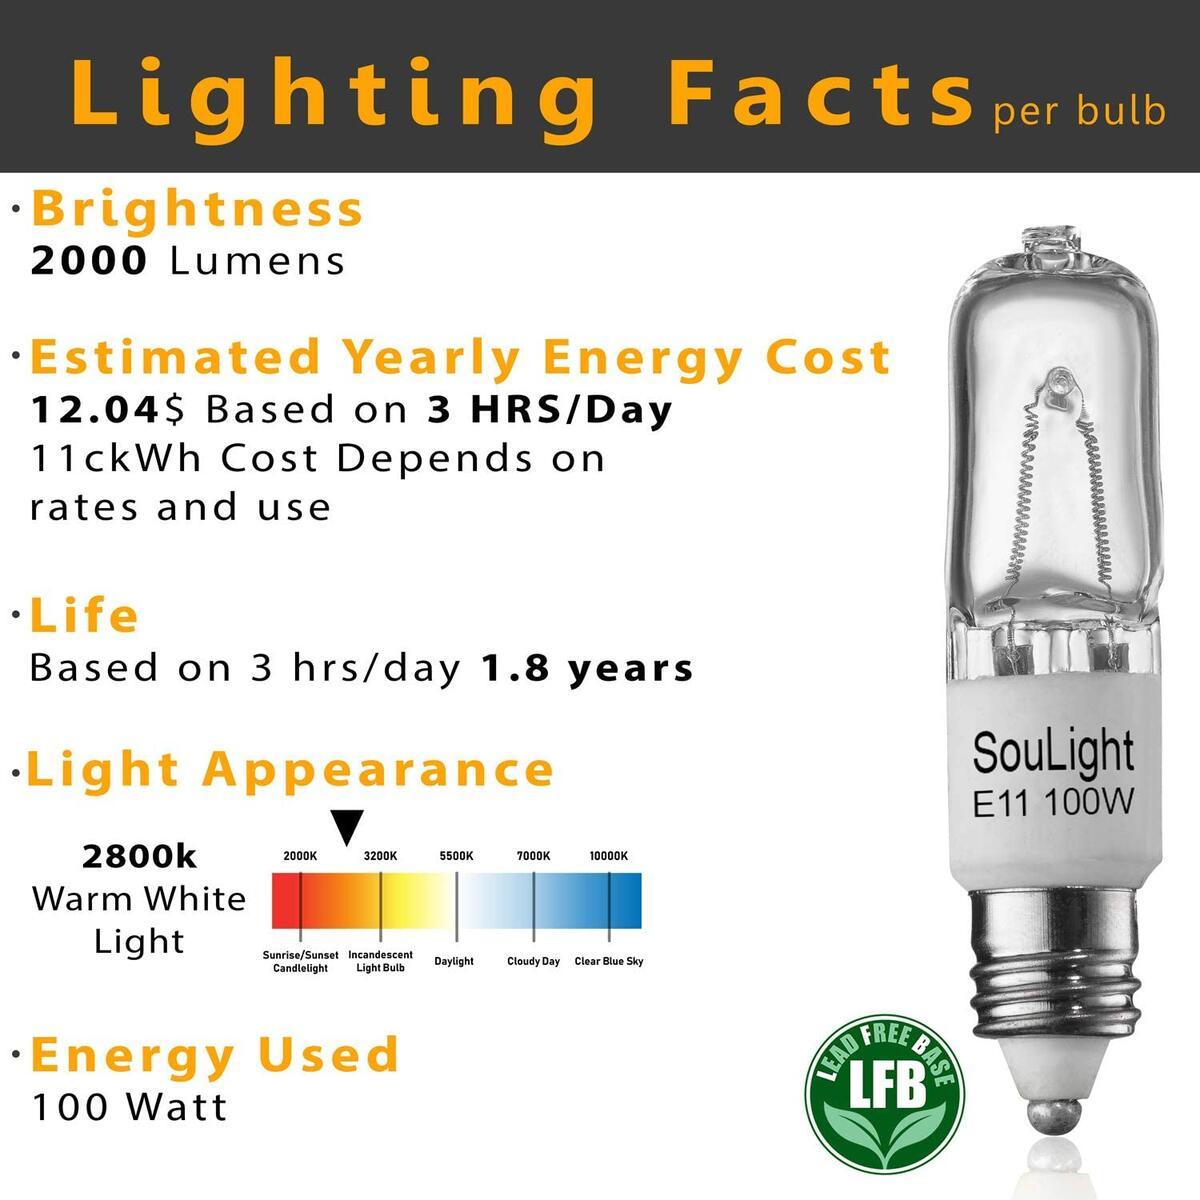 Halogen JDE11 120v 100W - Feit T4 E11 Mini-Candelabra Base Light Bulb - Warm White 2800K - Dimmable - Replacement Bulbs for Ceiling Fans, Chandeliers, Cabinet Lighting & More- 6 Pack